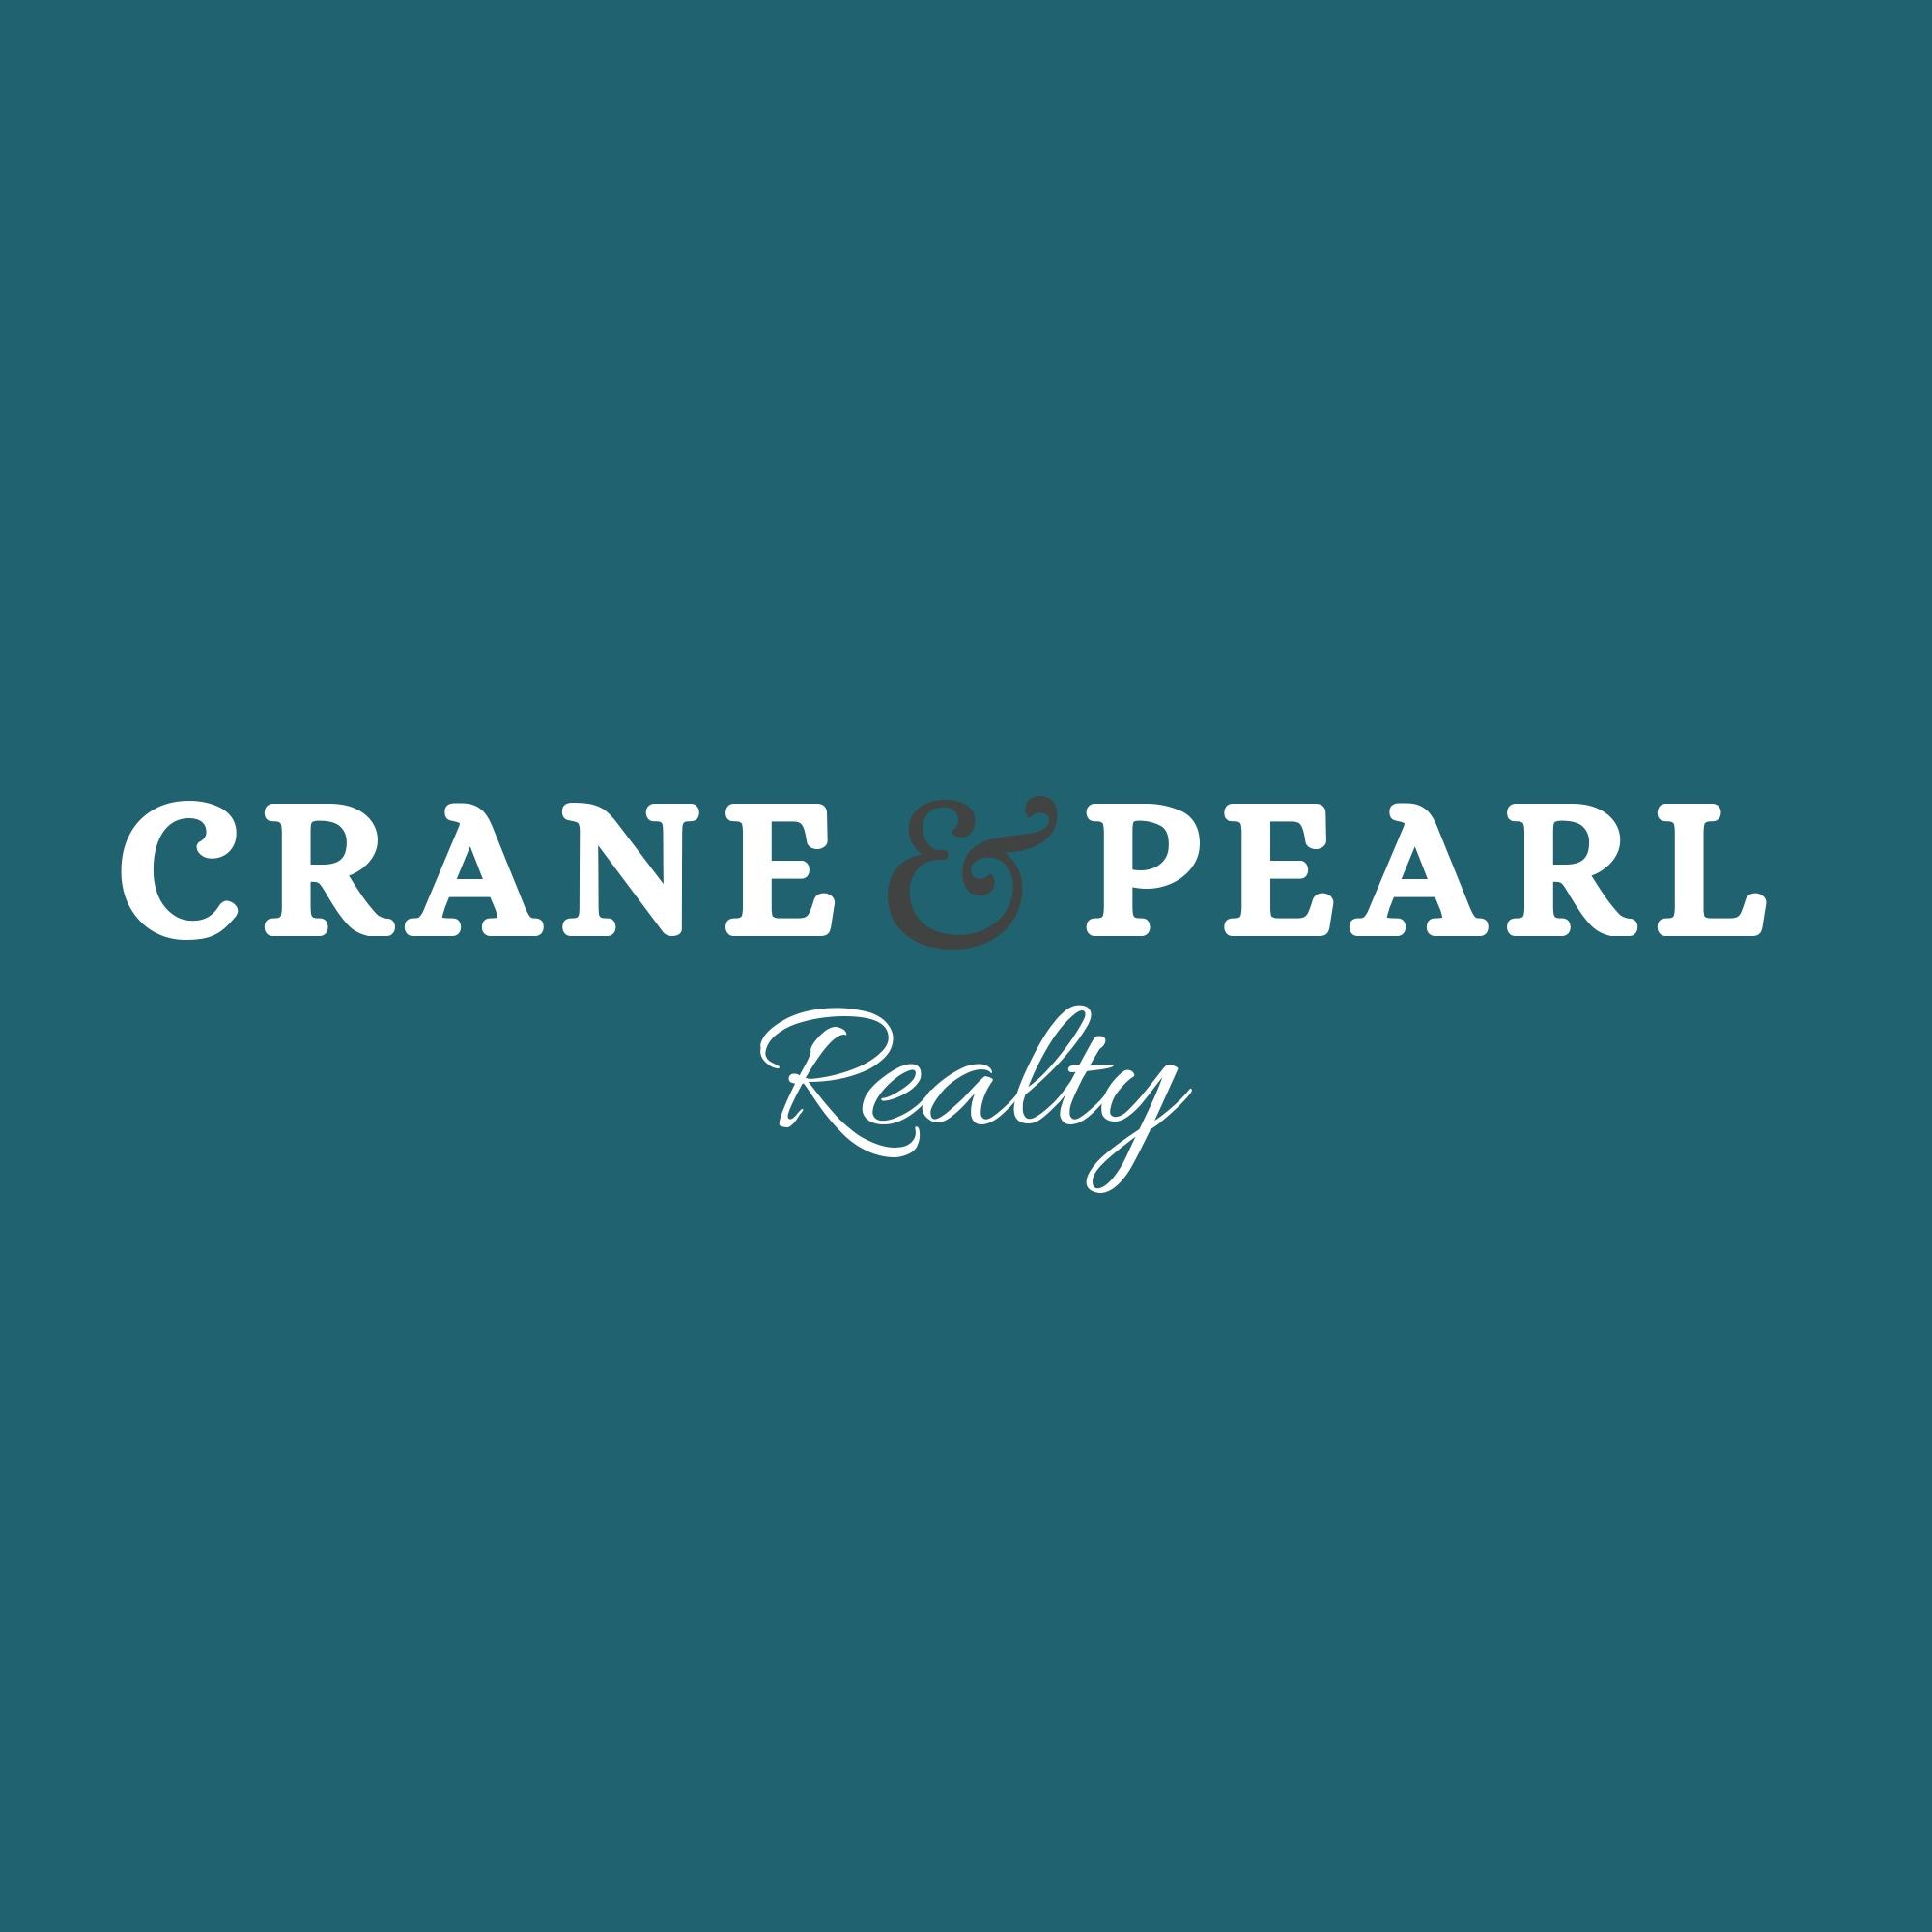 Crane & Pearl Realty logo